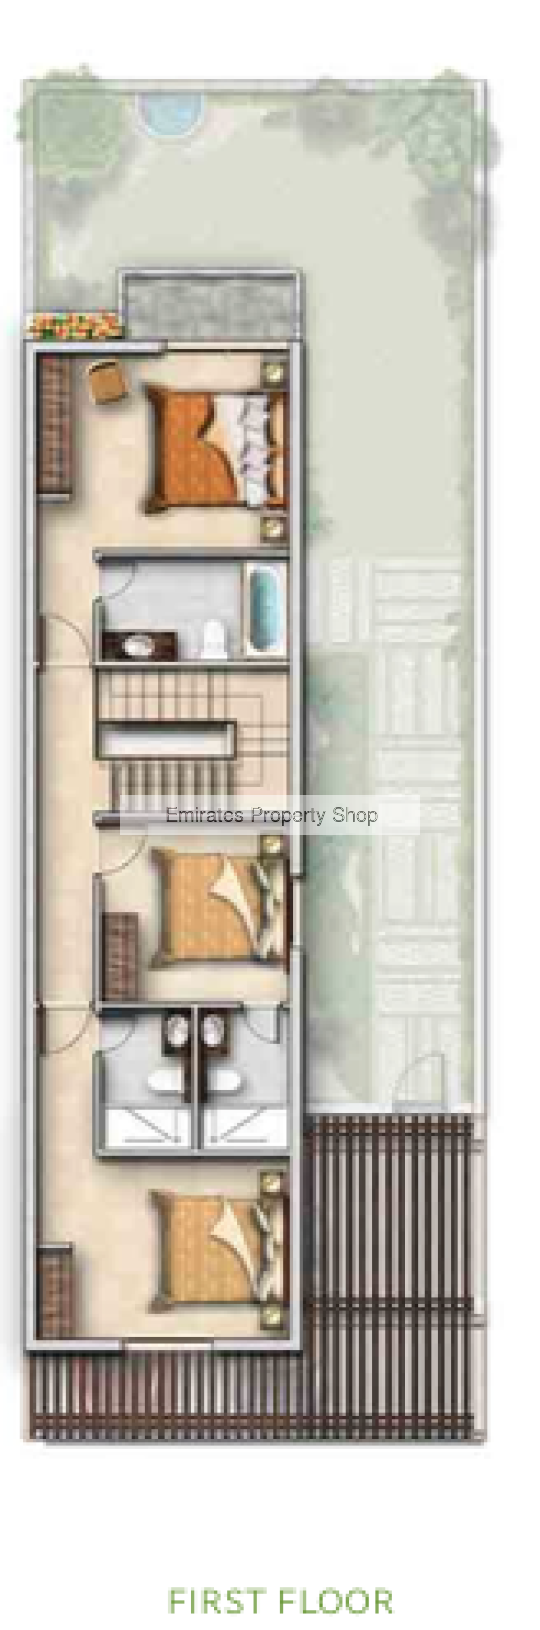 3 Bedroom Villa For Sale In Akoya Oxygen Dubai